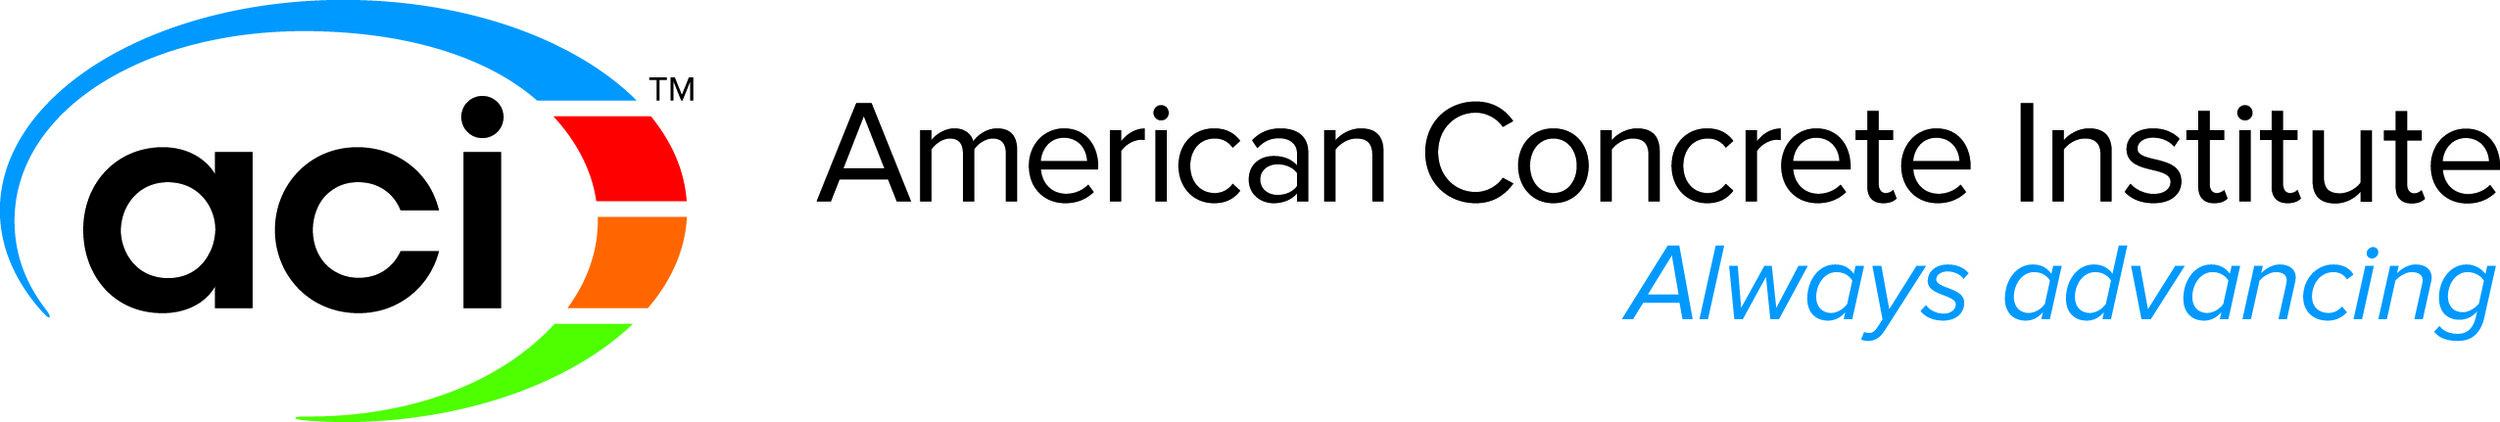 American_Concrete_Institute_2014_Logo.jpg